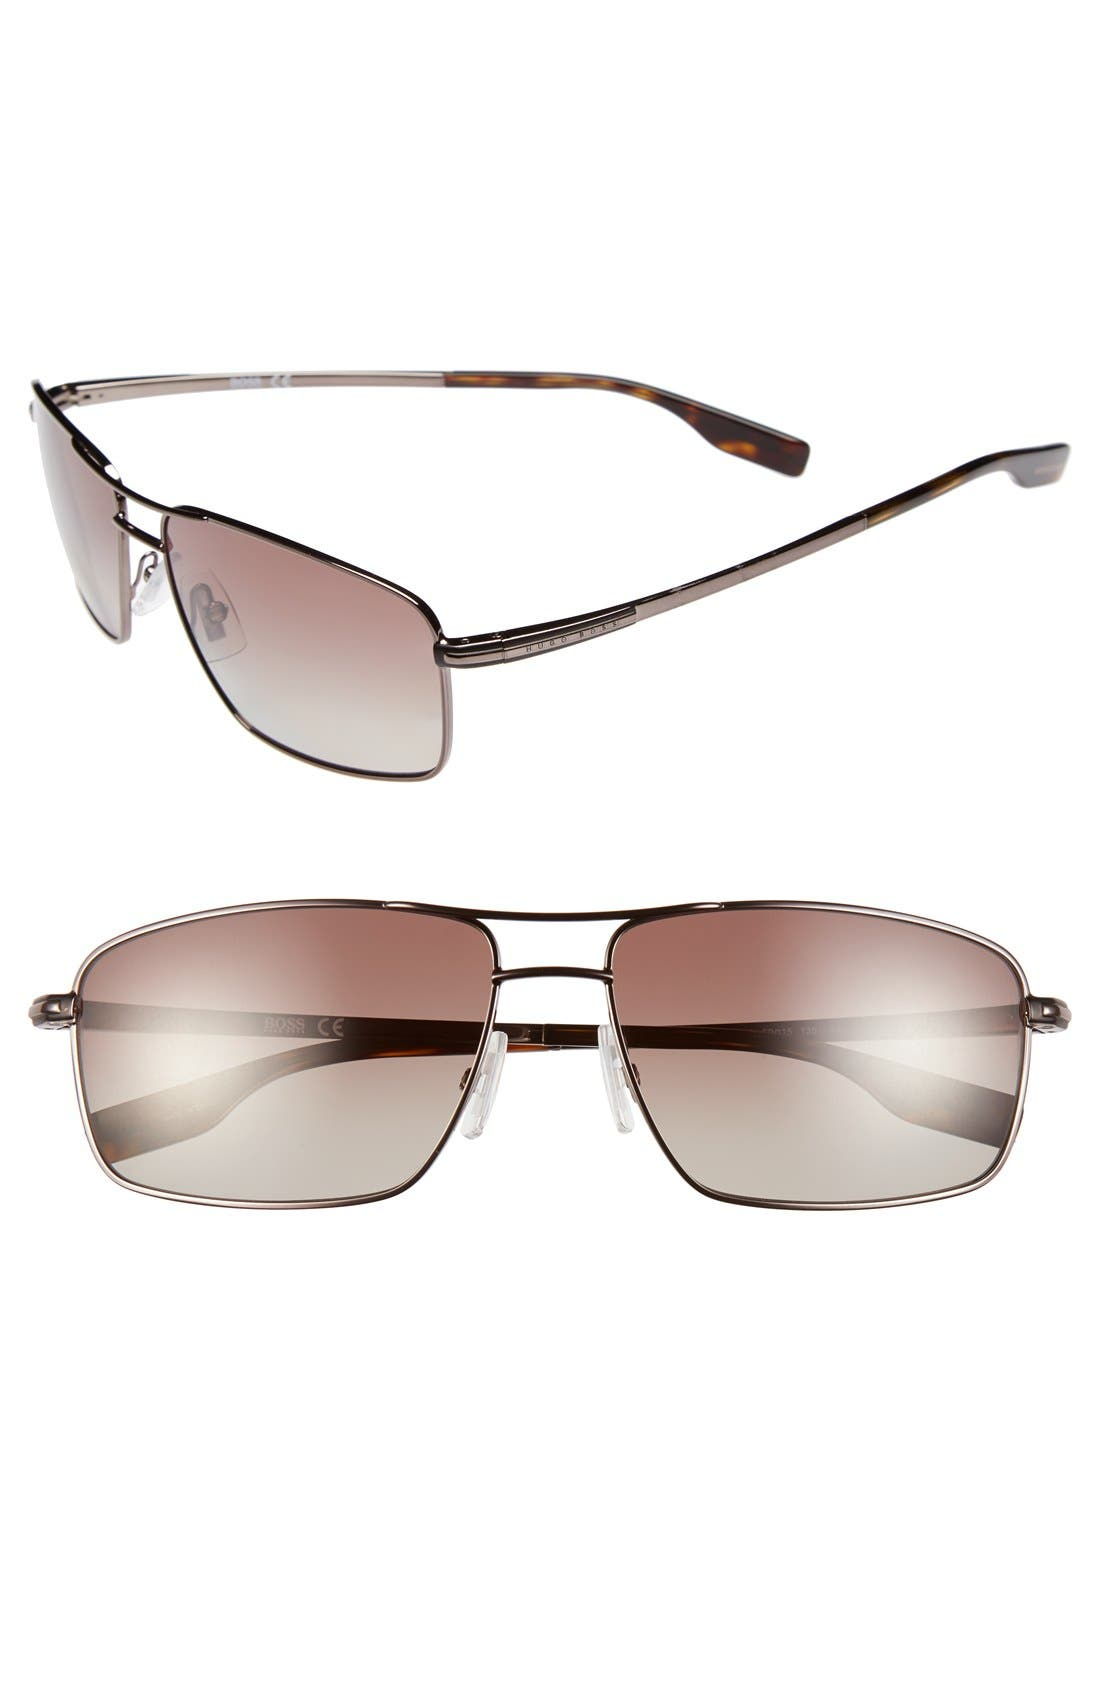 59mm Polarized Navigator Sunglasses,                             Main thumbnail 1, color,                             Dark Ruthenium